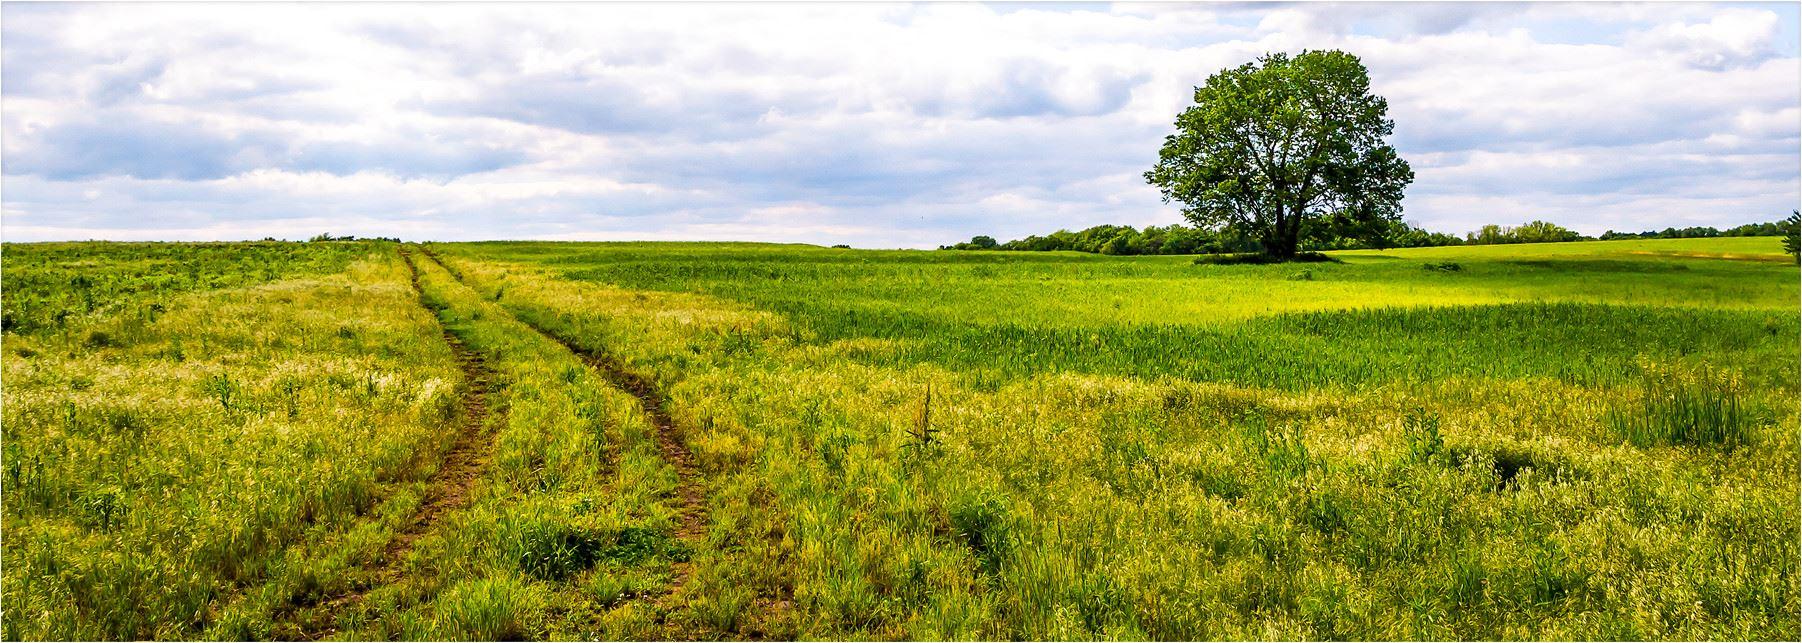 Kansas dickinson county solomon -  Quicklinks Aspx